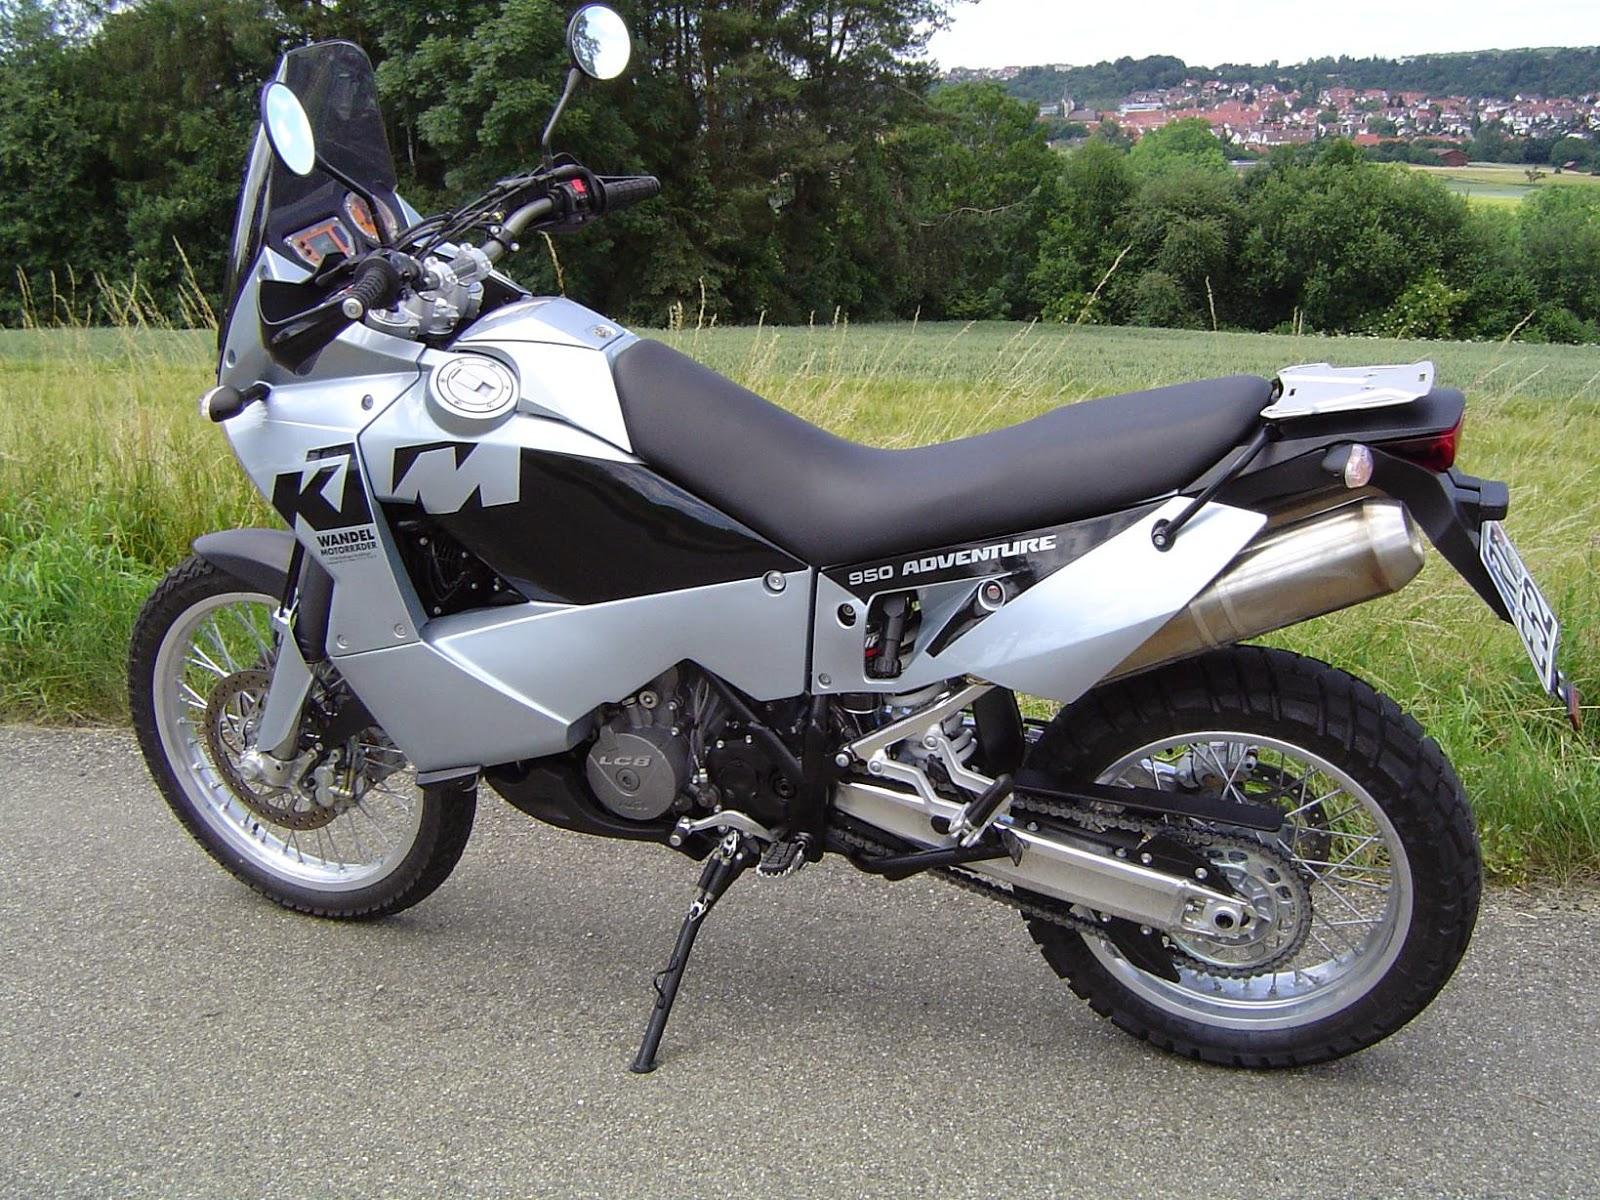 KTM 950 Adventure White Bikes Images